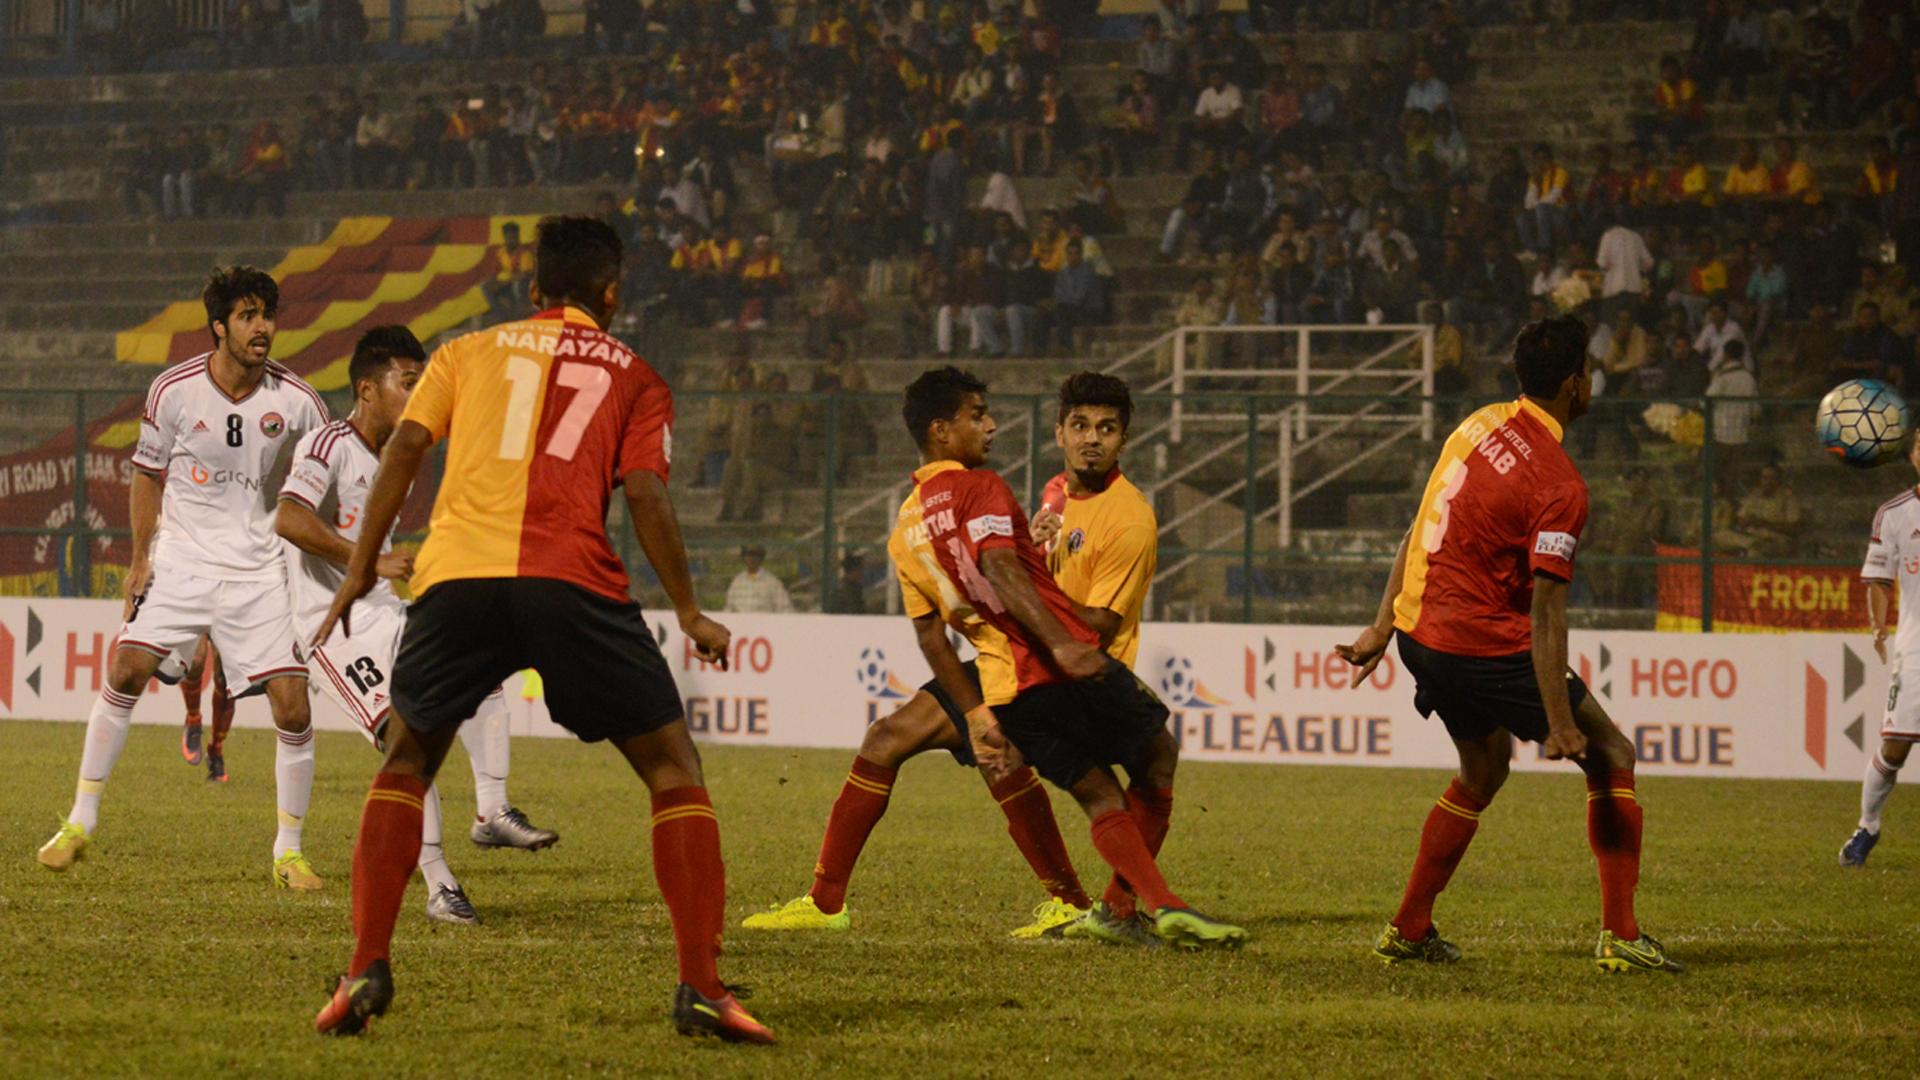 East Bengal 1 - 1 Shillong Lajong Match report - 15/02/17 ...